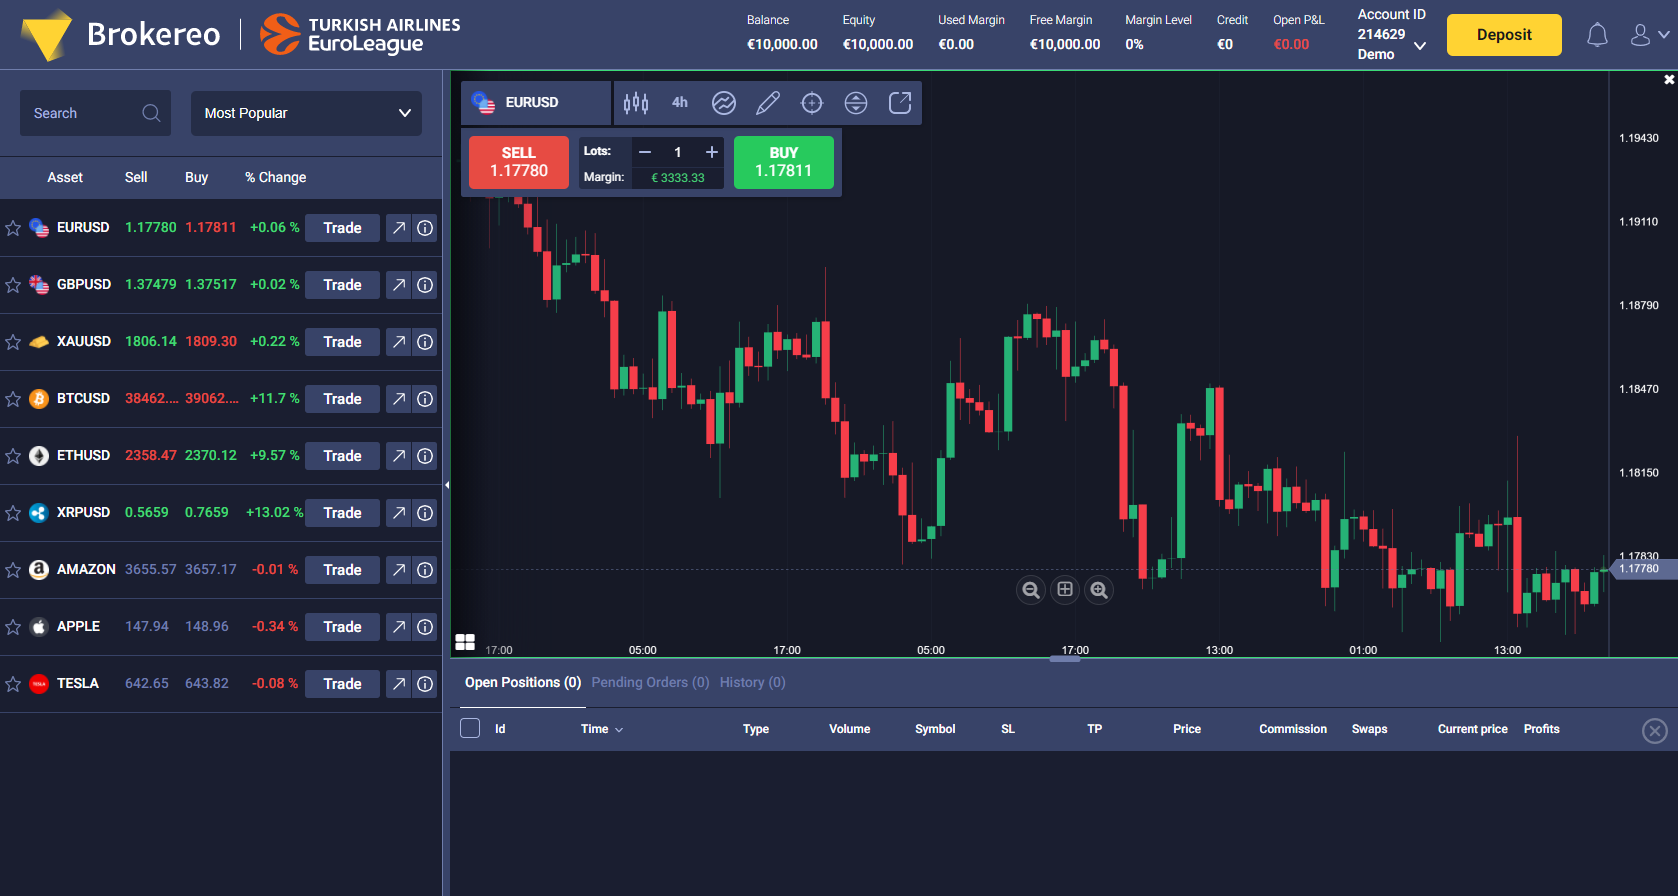 Brokereo Trading View